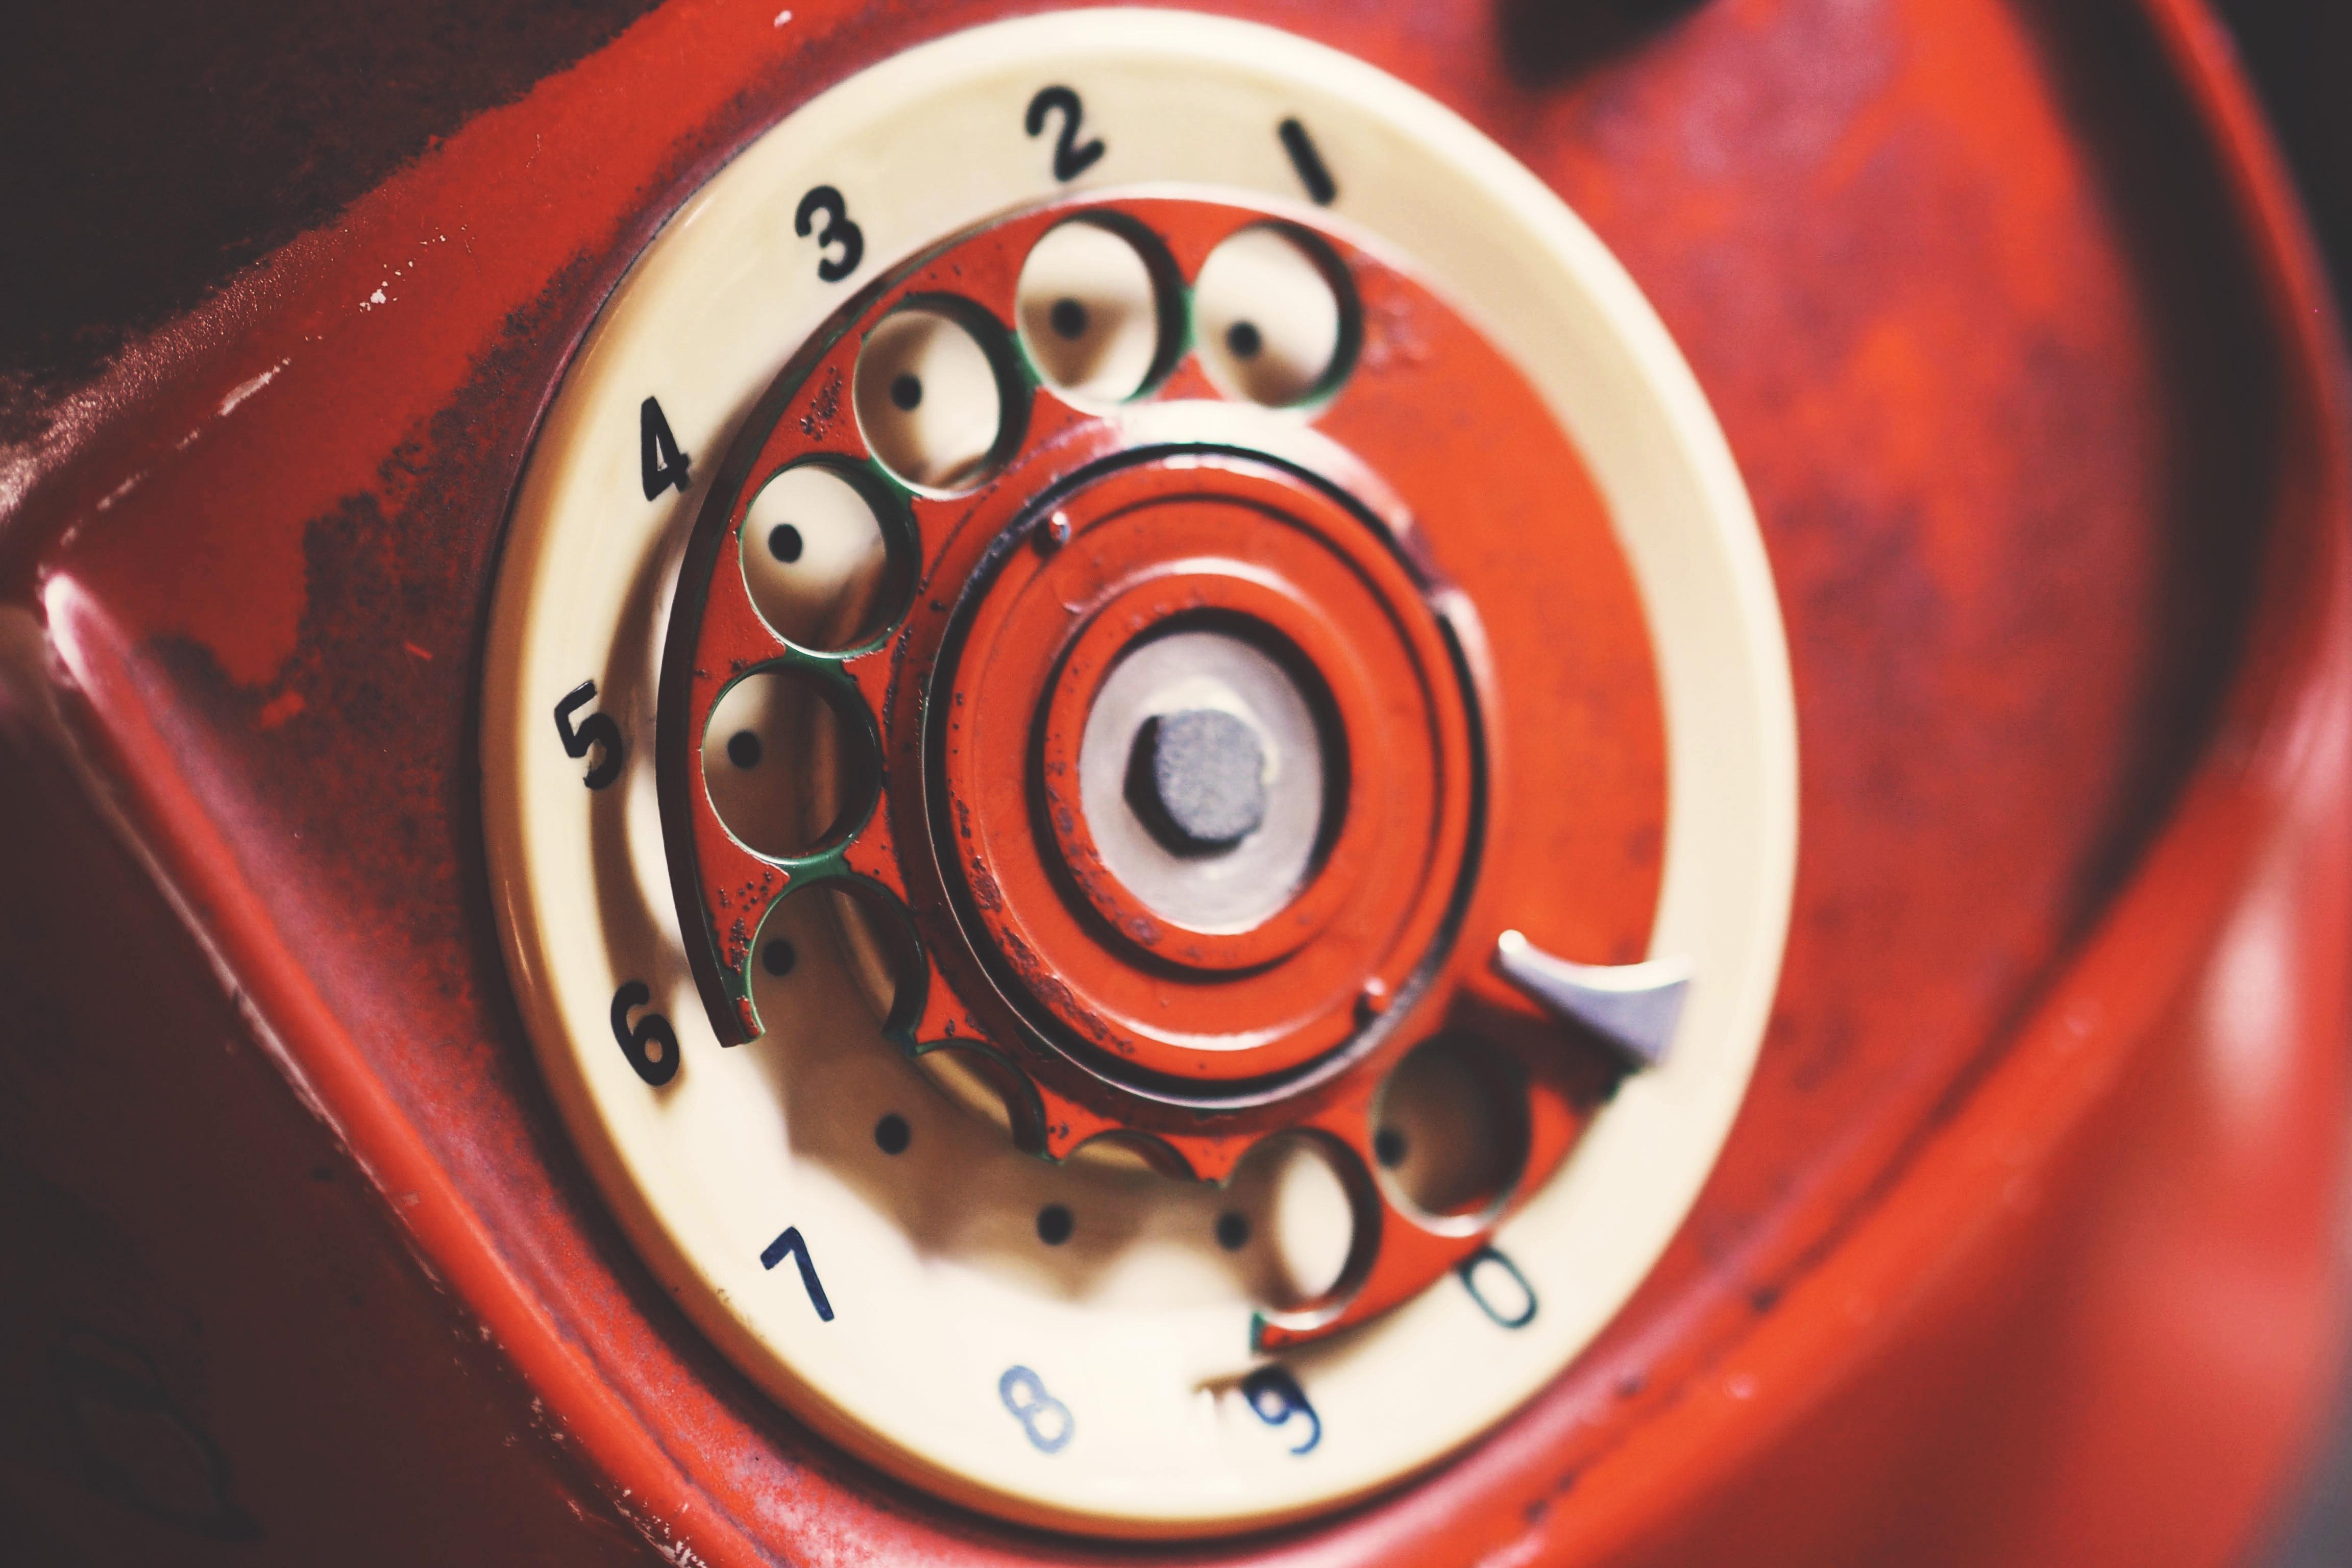 Close-up Photo of Rotary Telephone, Aged, Vintage, Telephone, Technology, HQ Photo